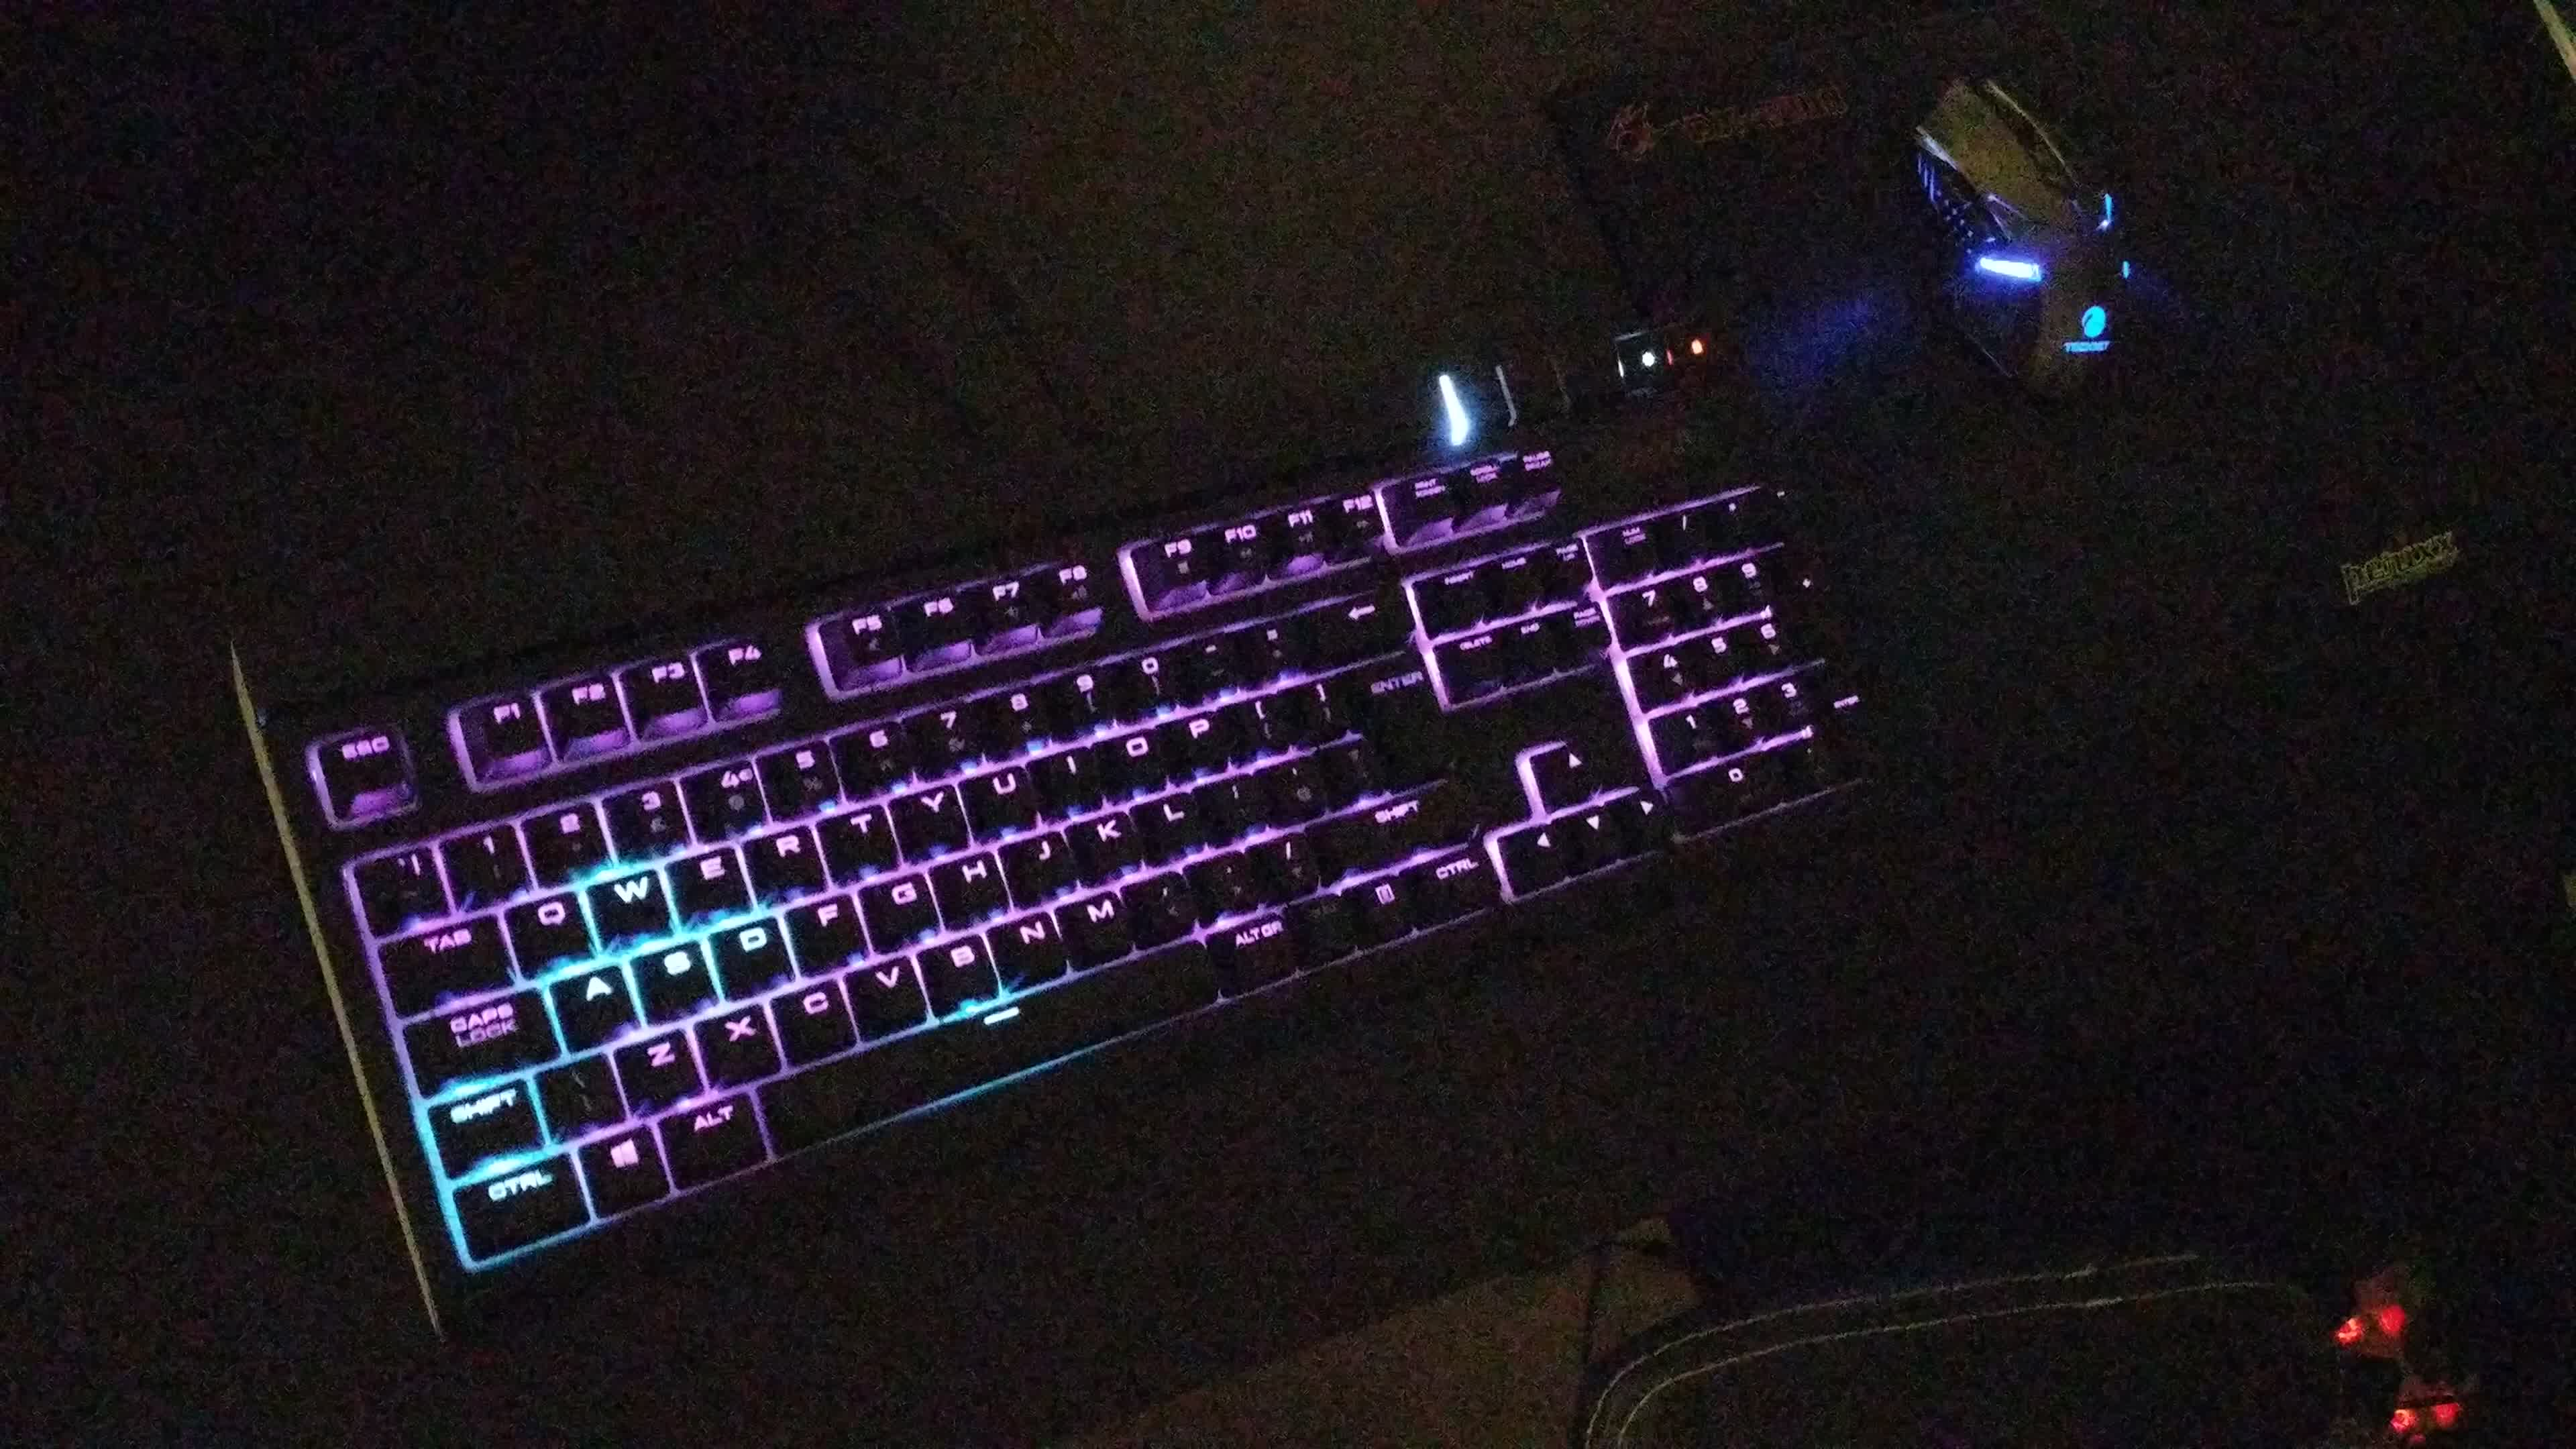 corsair, keyboard, mechanical, outrun, rgb, strafe, Corsair Strafe RGB - Outrun GIFs